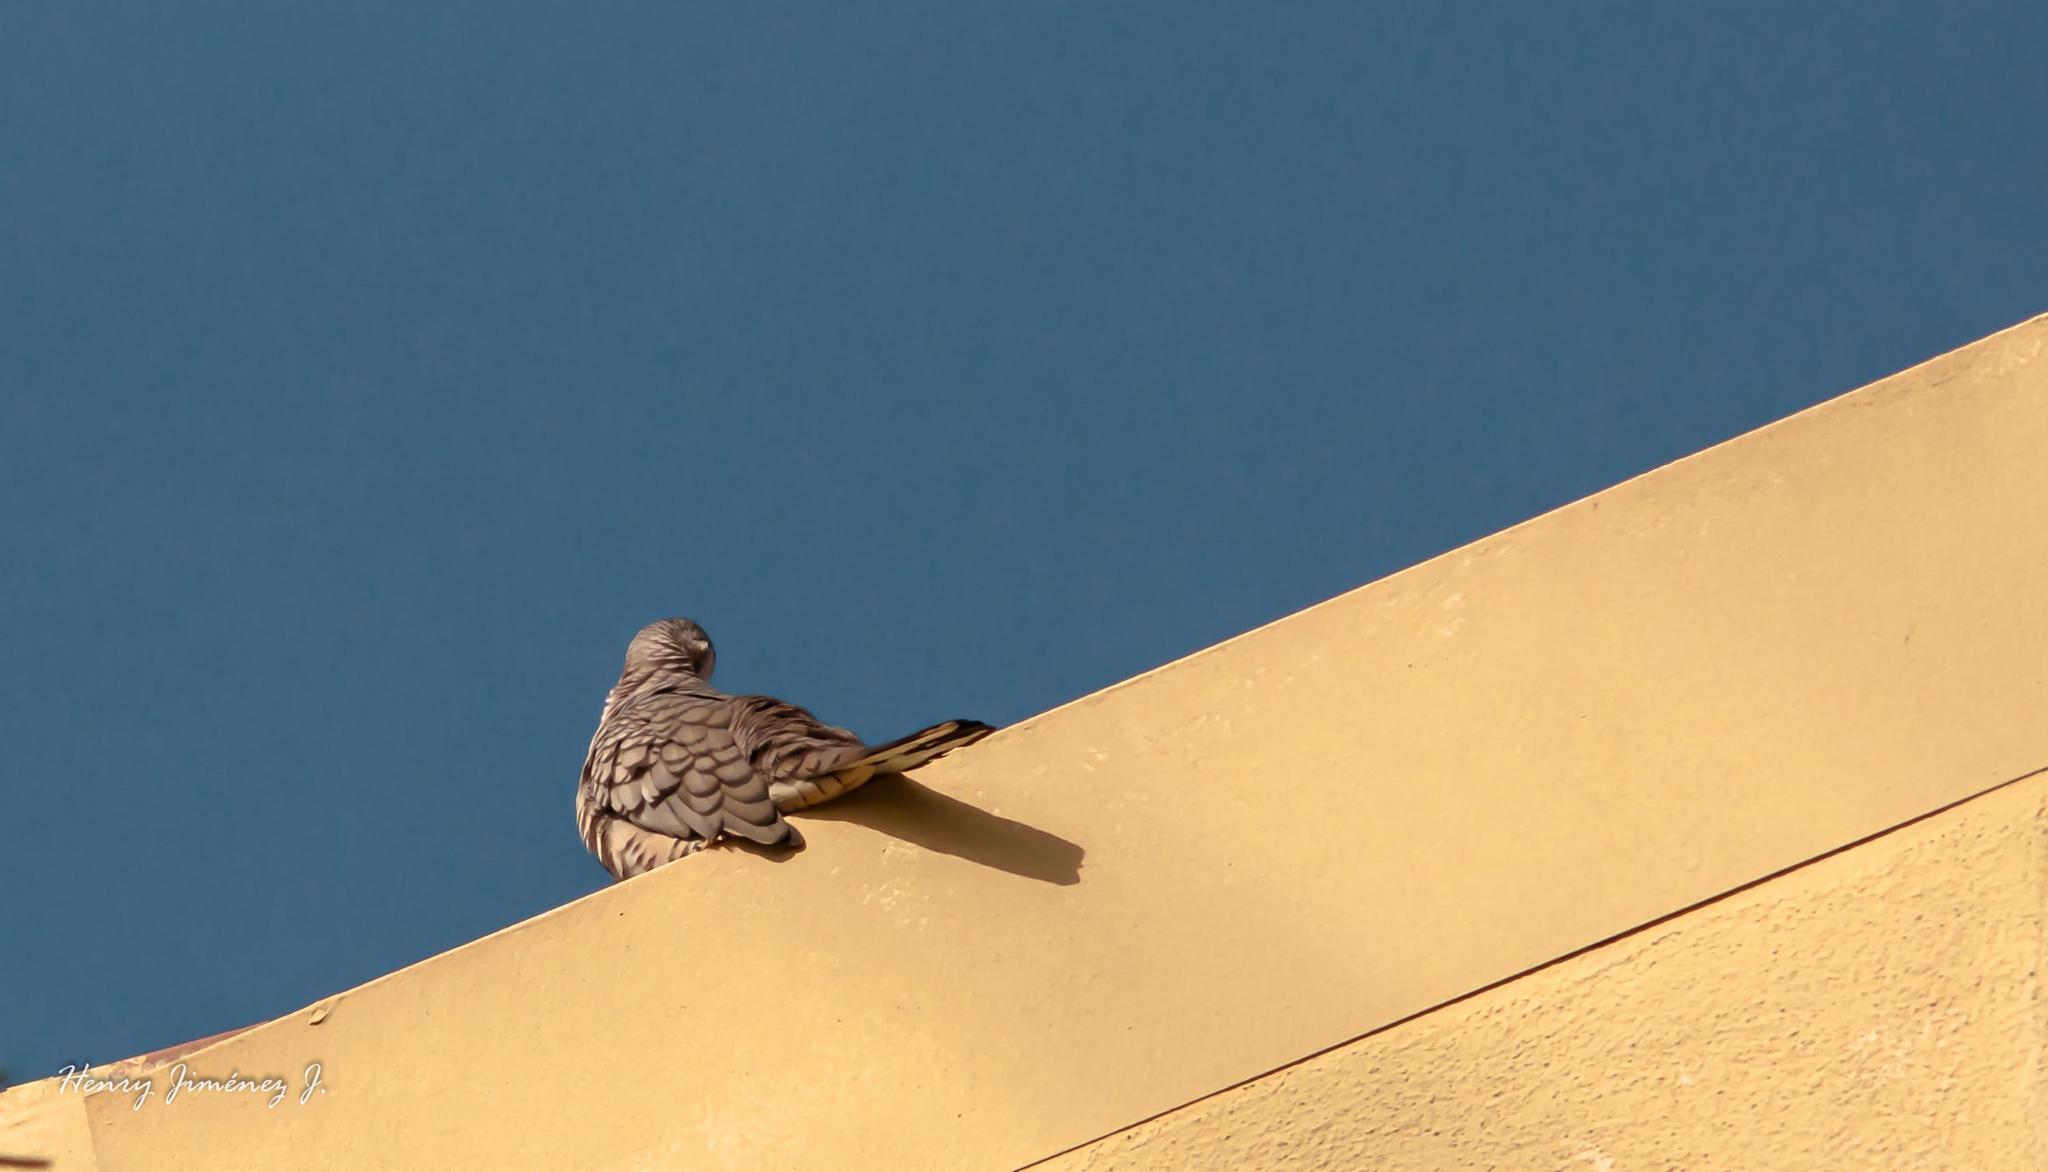 De aves: La curruca. by Henry Jiménez J